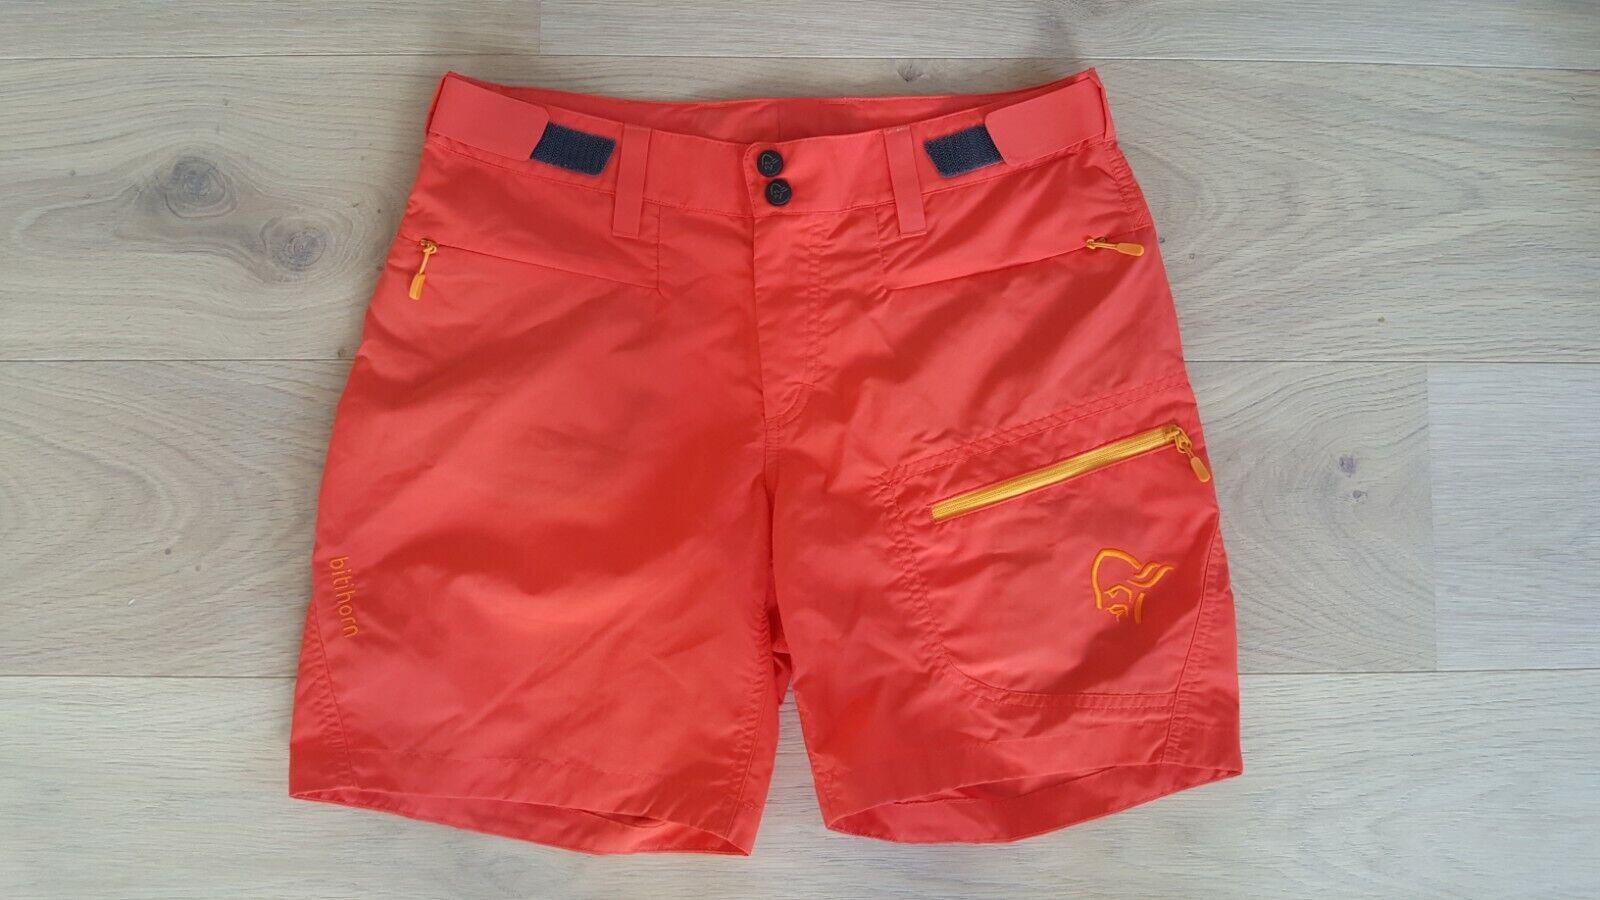 Norrøna Bitihorn ligero shorts talla senderismo Trekking  pantalones de las mujeres S  ventas de salida